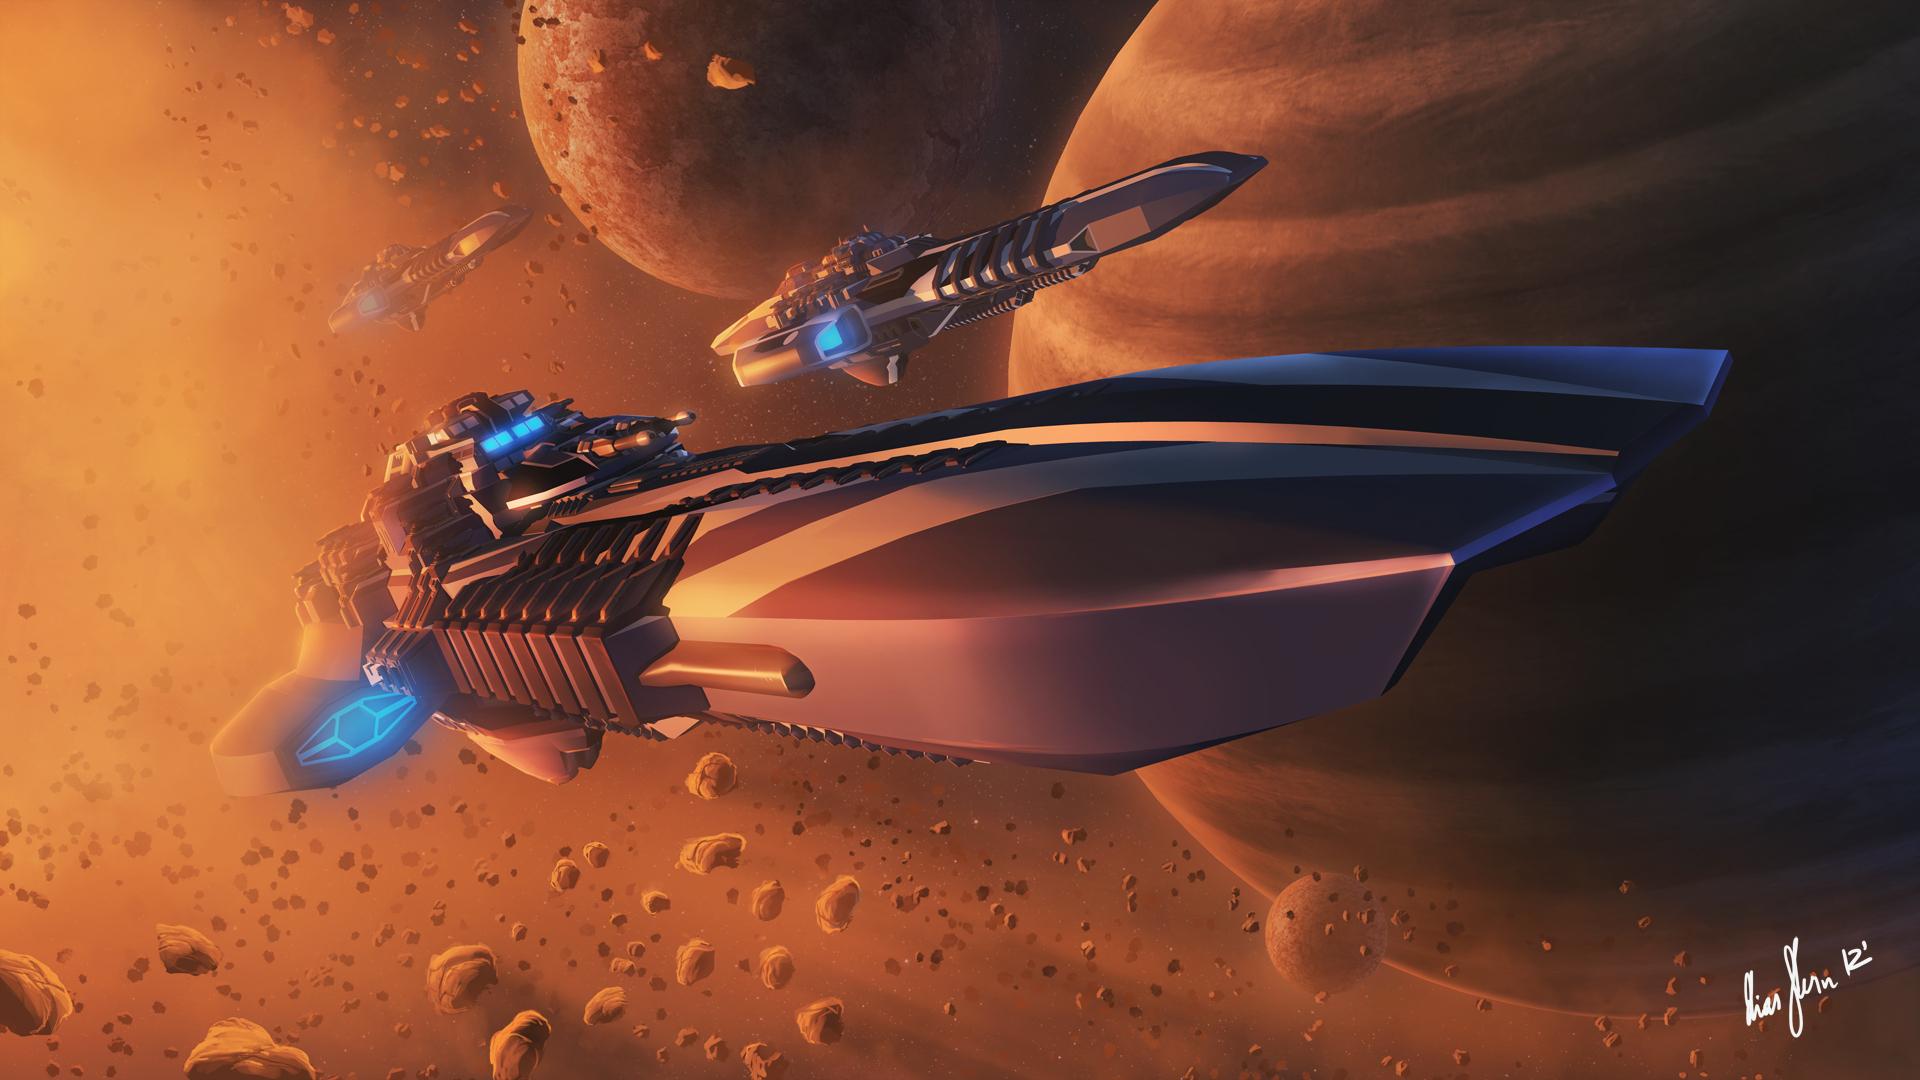 Photos Planets asteroid Starship Space Fantasy Technics Fantasy 1920x1080 planet Asteroids